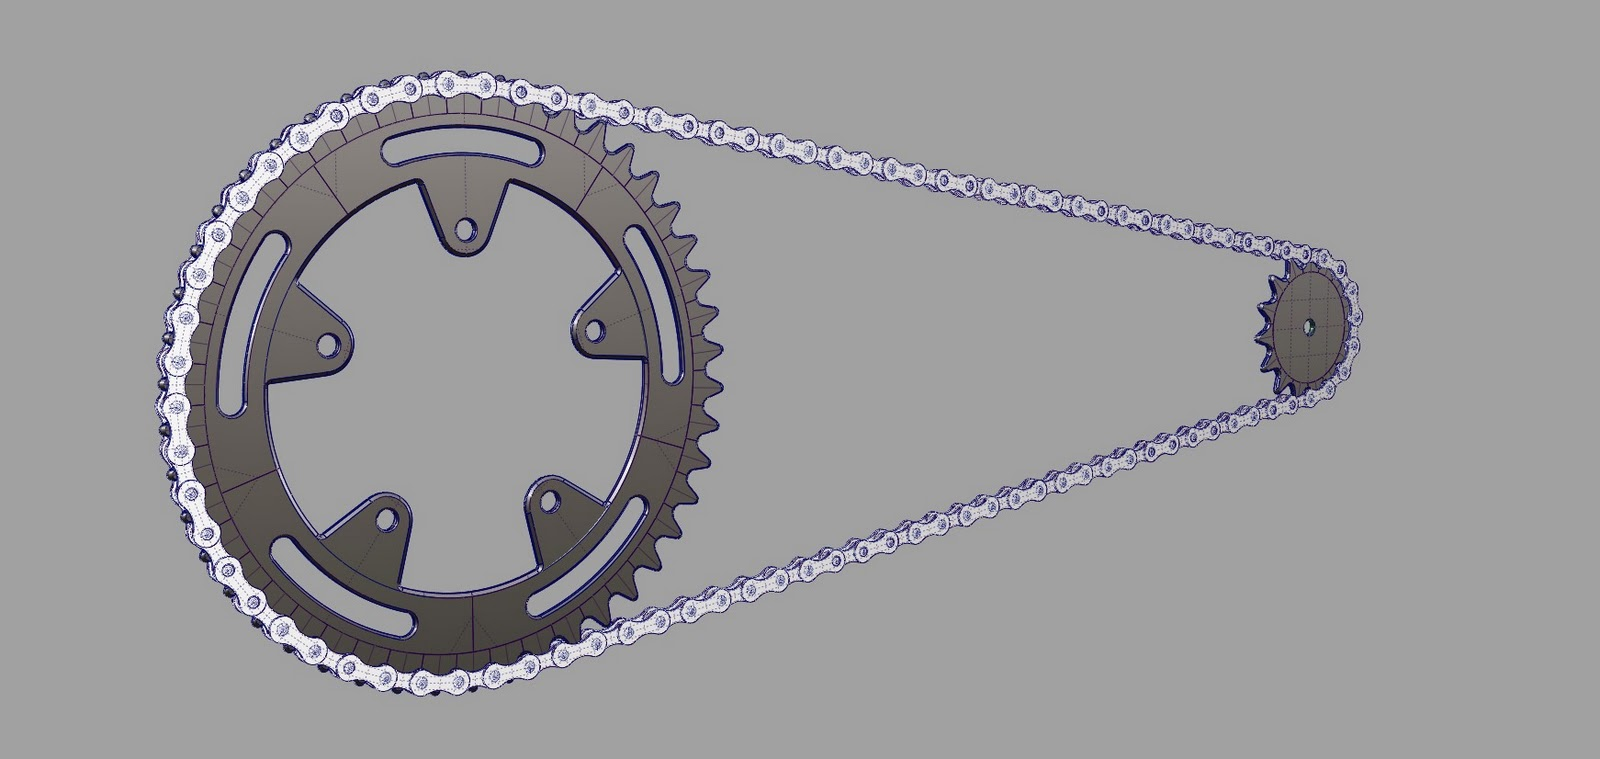 10 Speed Bike Gear Diagram : Bike chain diagram map elsavadorla